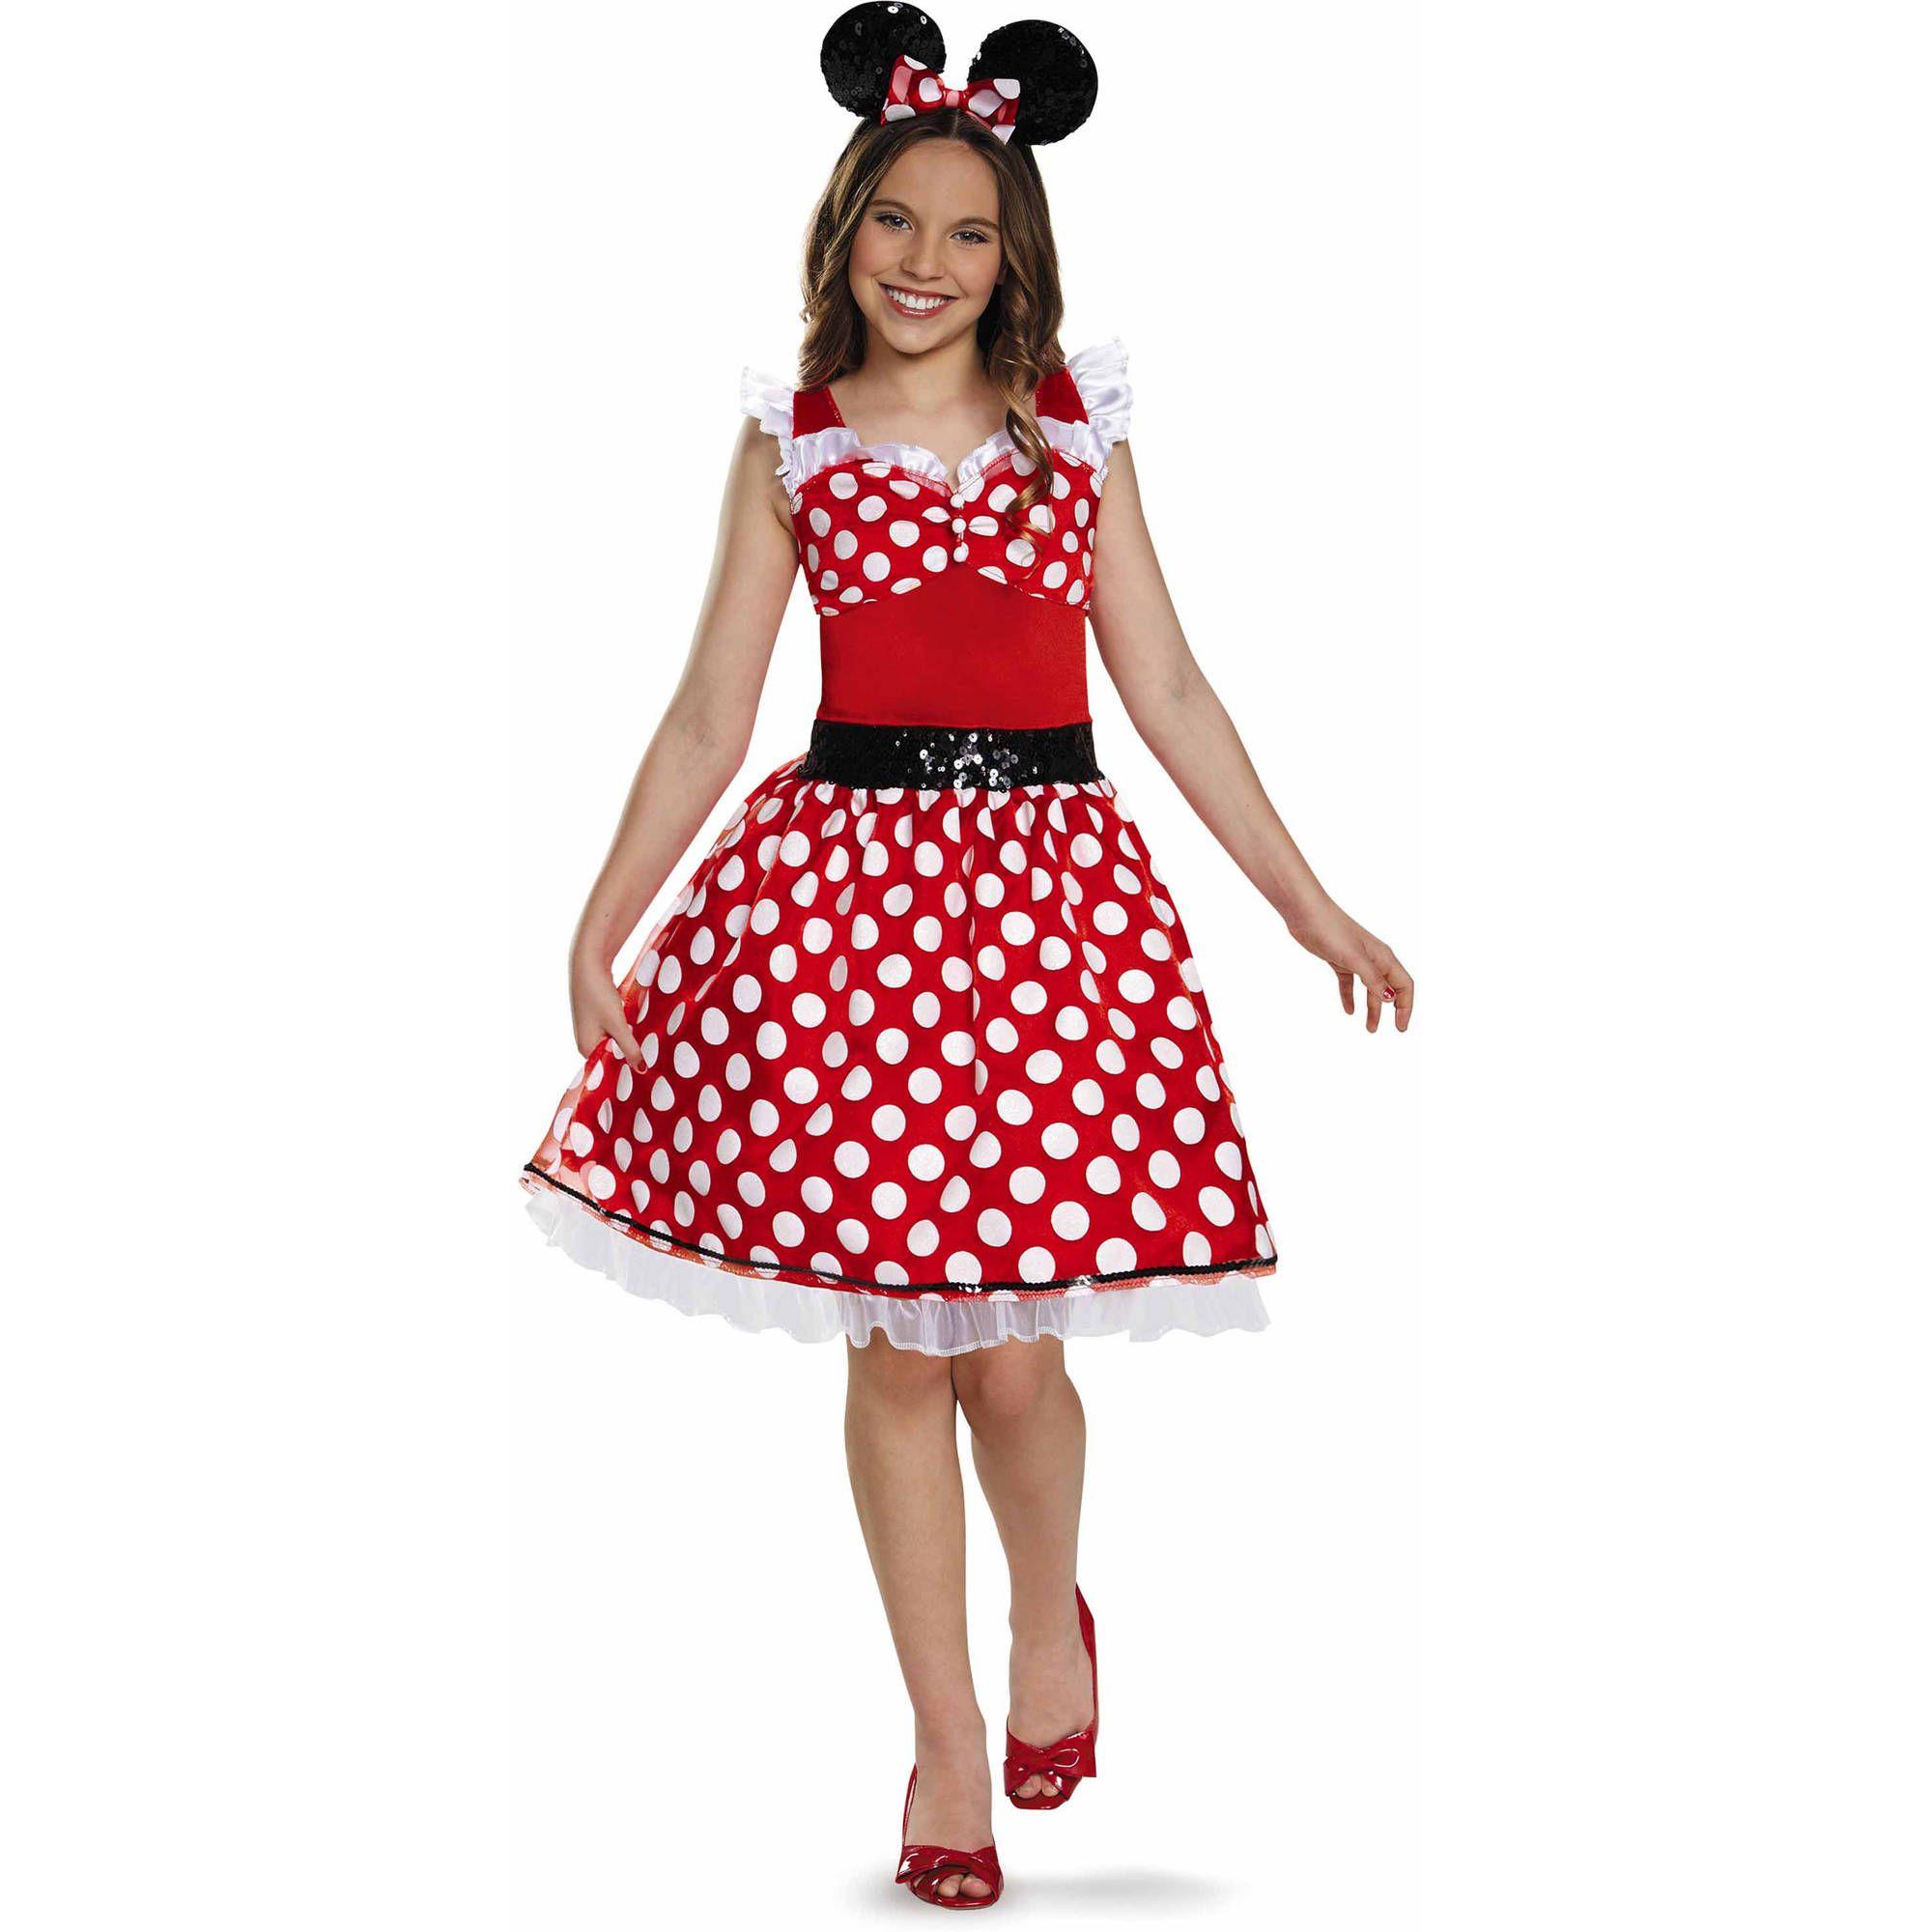 Halloween Costumes for Adult Girls Halloween costumes